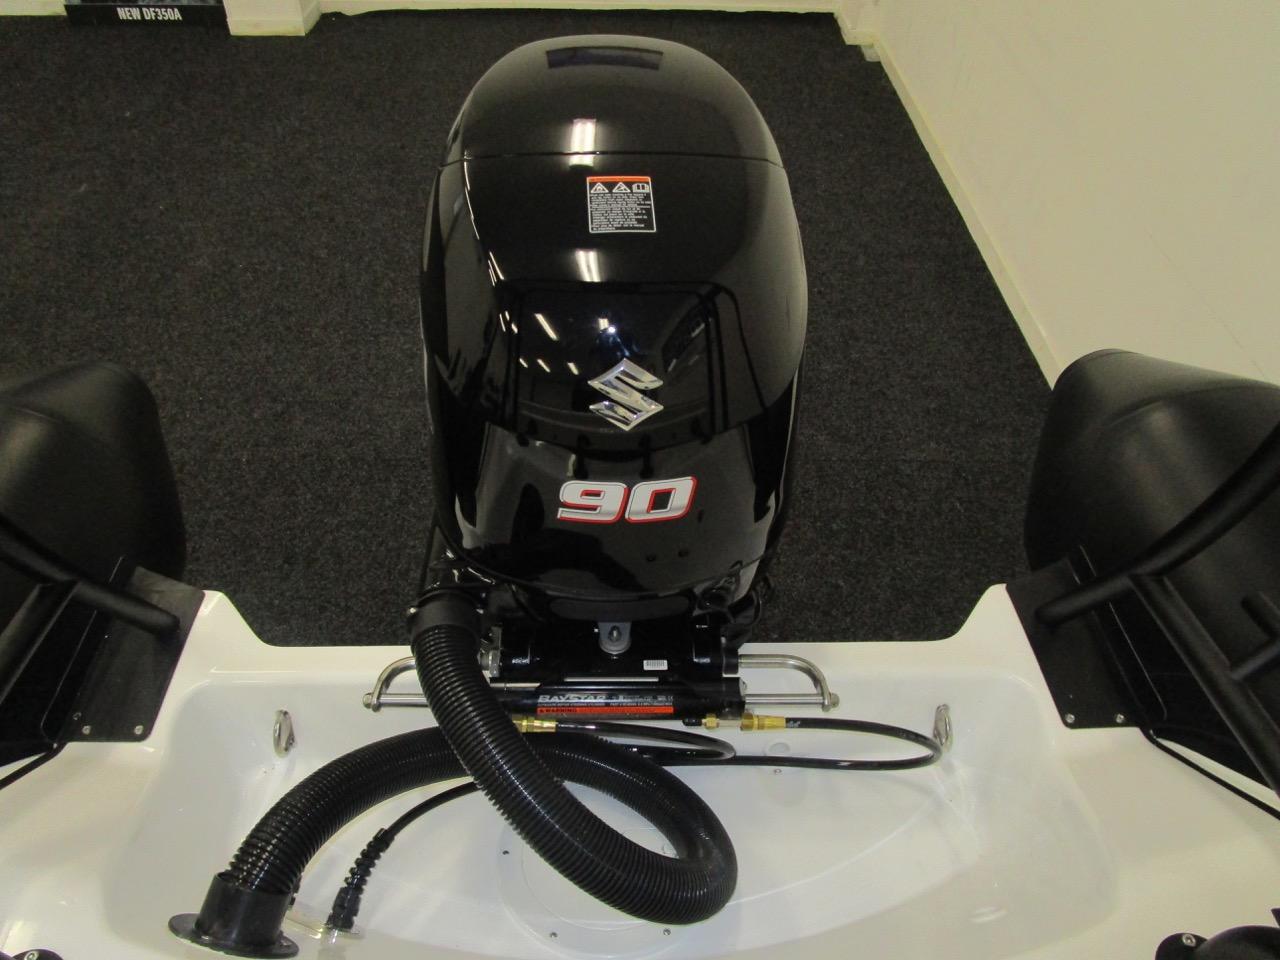 Suzuki DF90ATL and Baystar steering